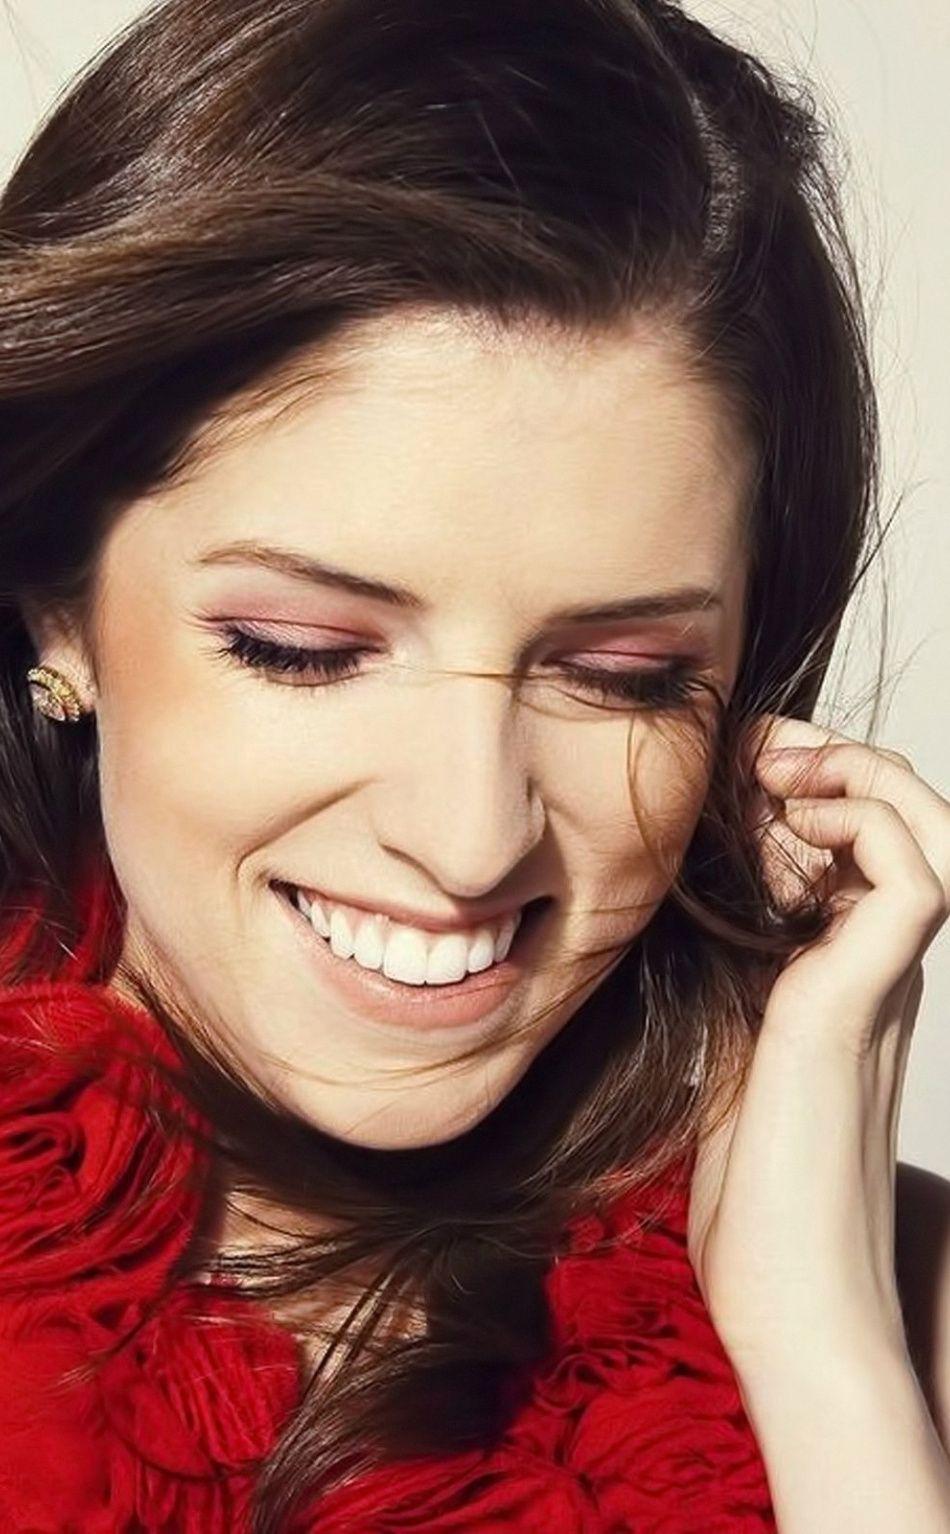 Happy Beautiful Anna Kendrick Actress 950x1534 Wallpaper Celebrity Wallpapers Free Hd Wallpapers Actresses